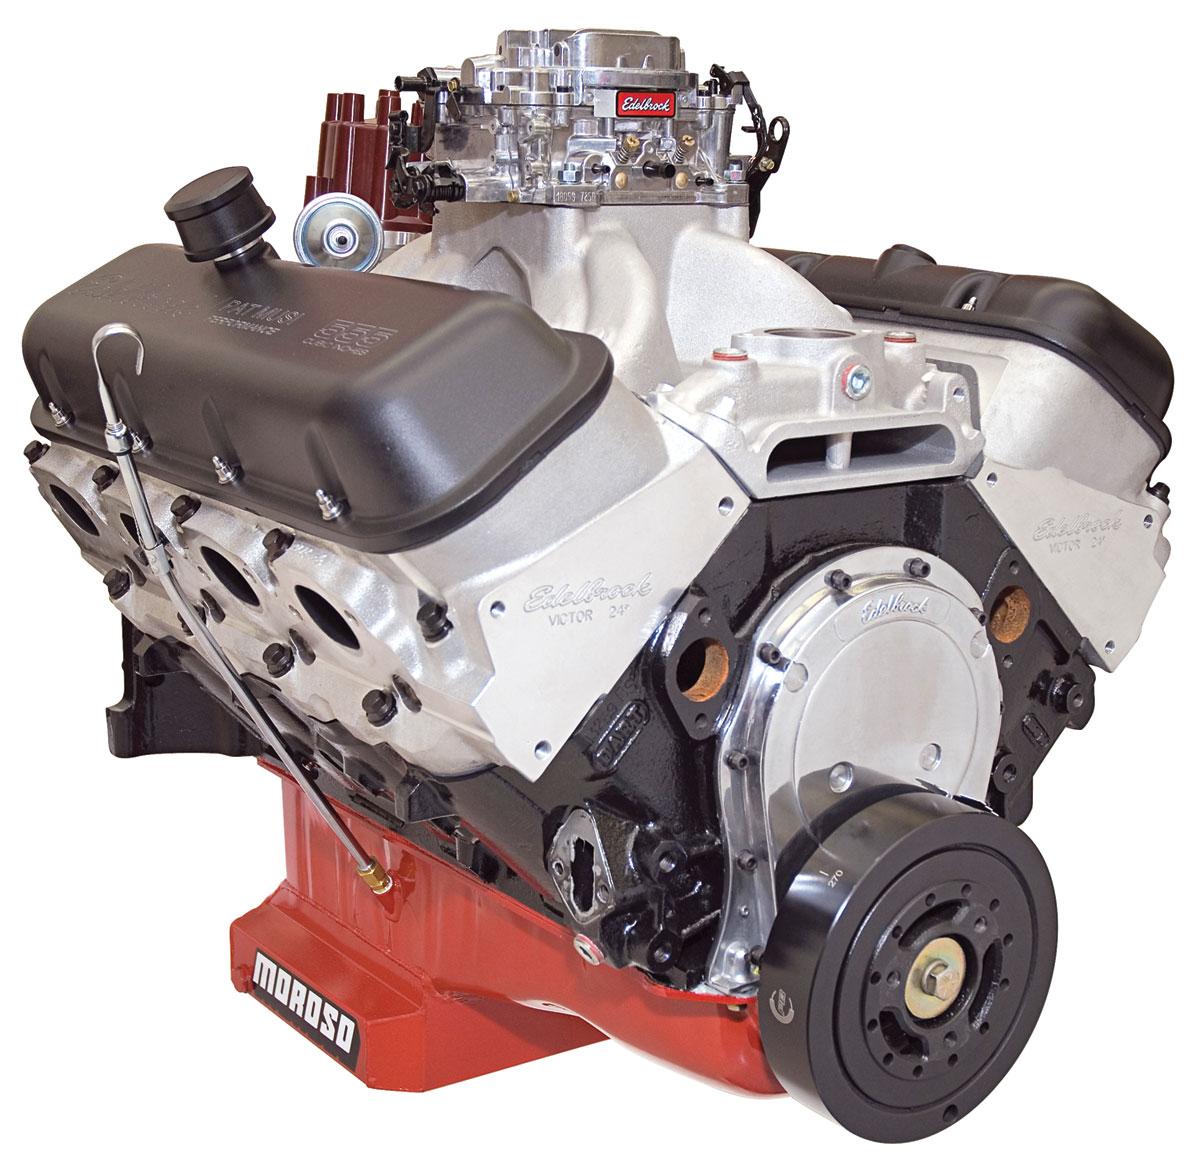 Crate Engine, 555 RPM Carbureted, Edelbrock/Musi, Big Block Chevrolet